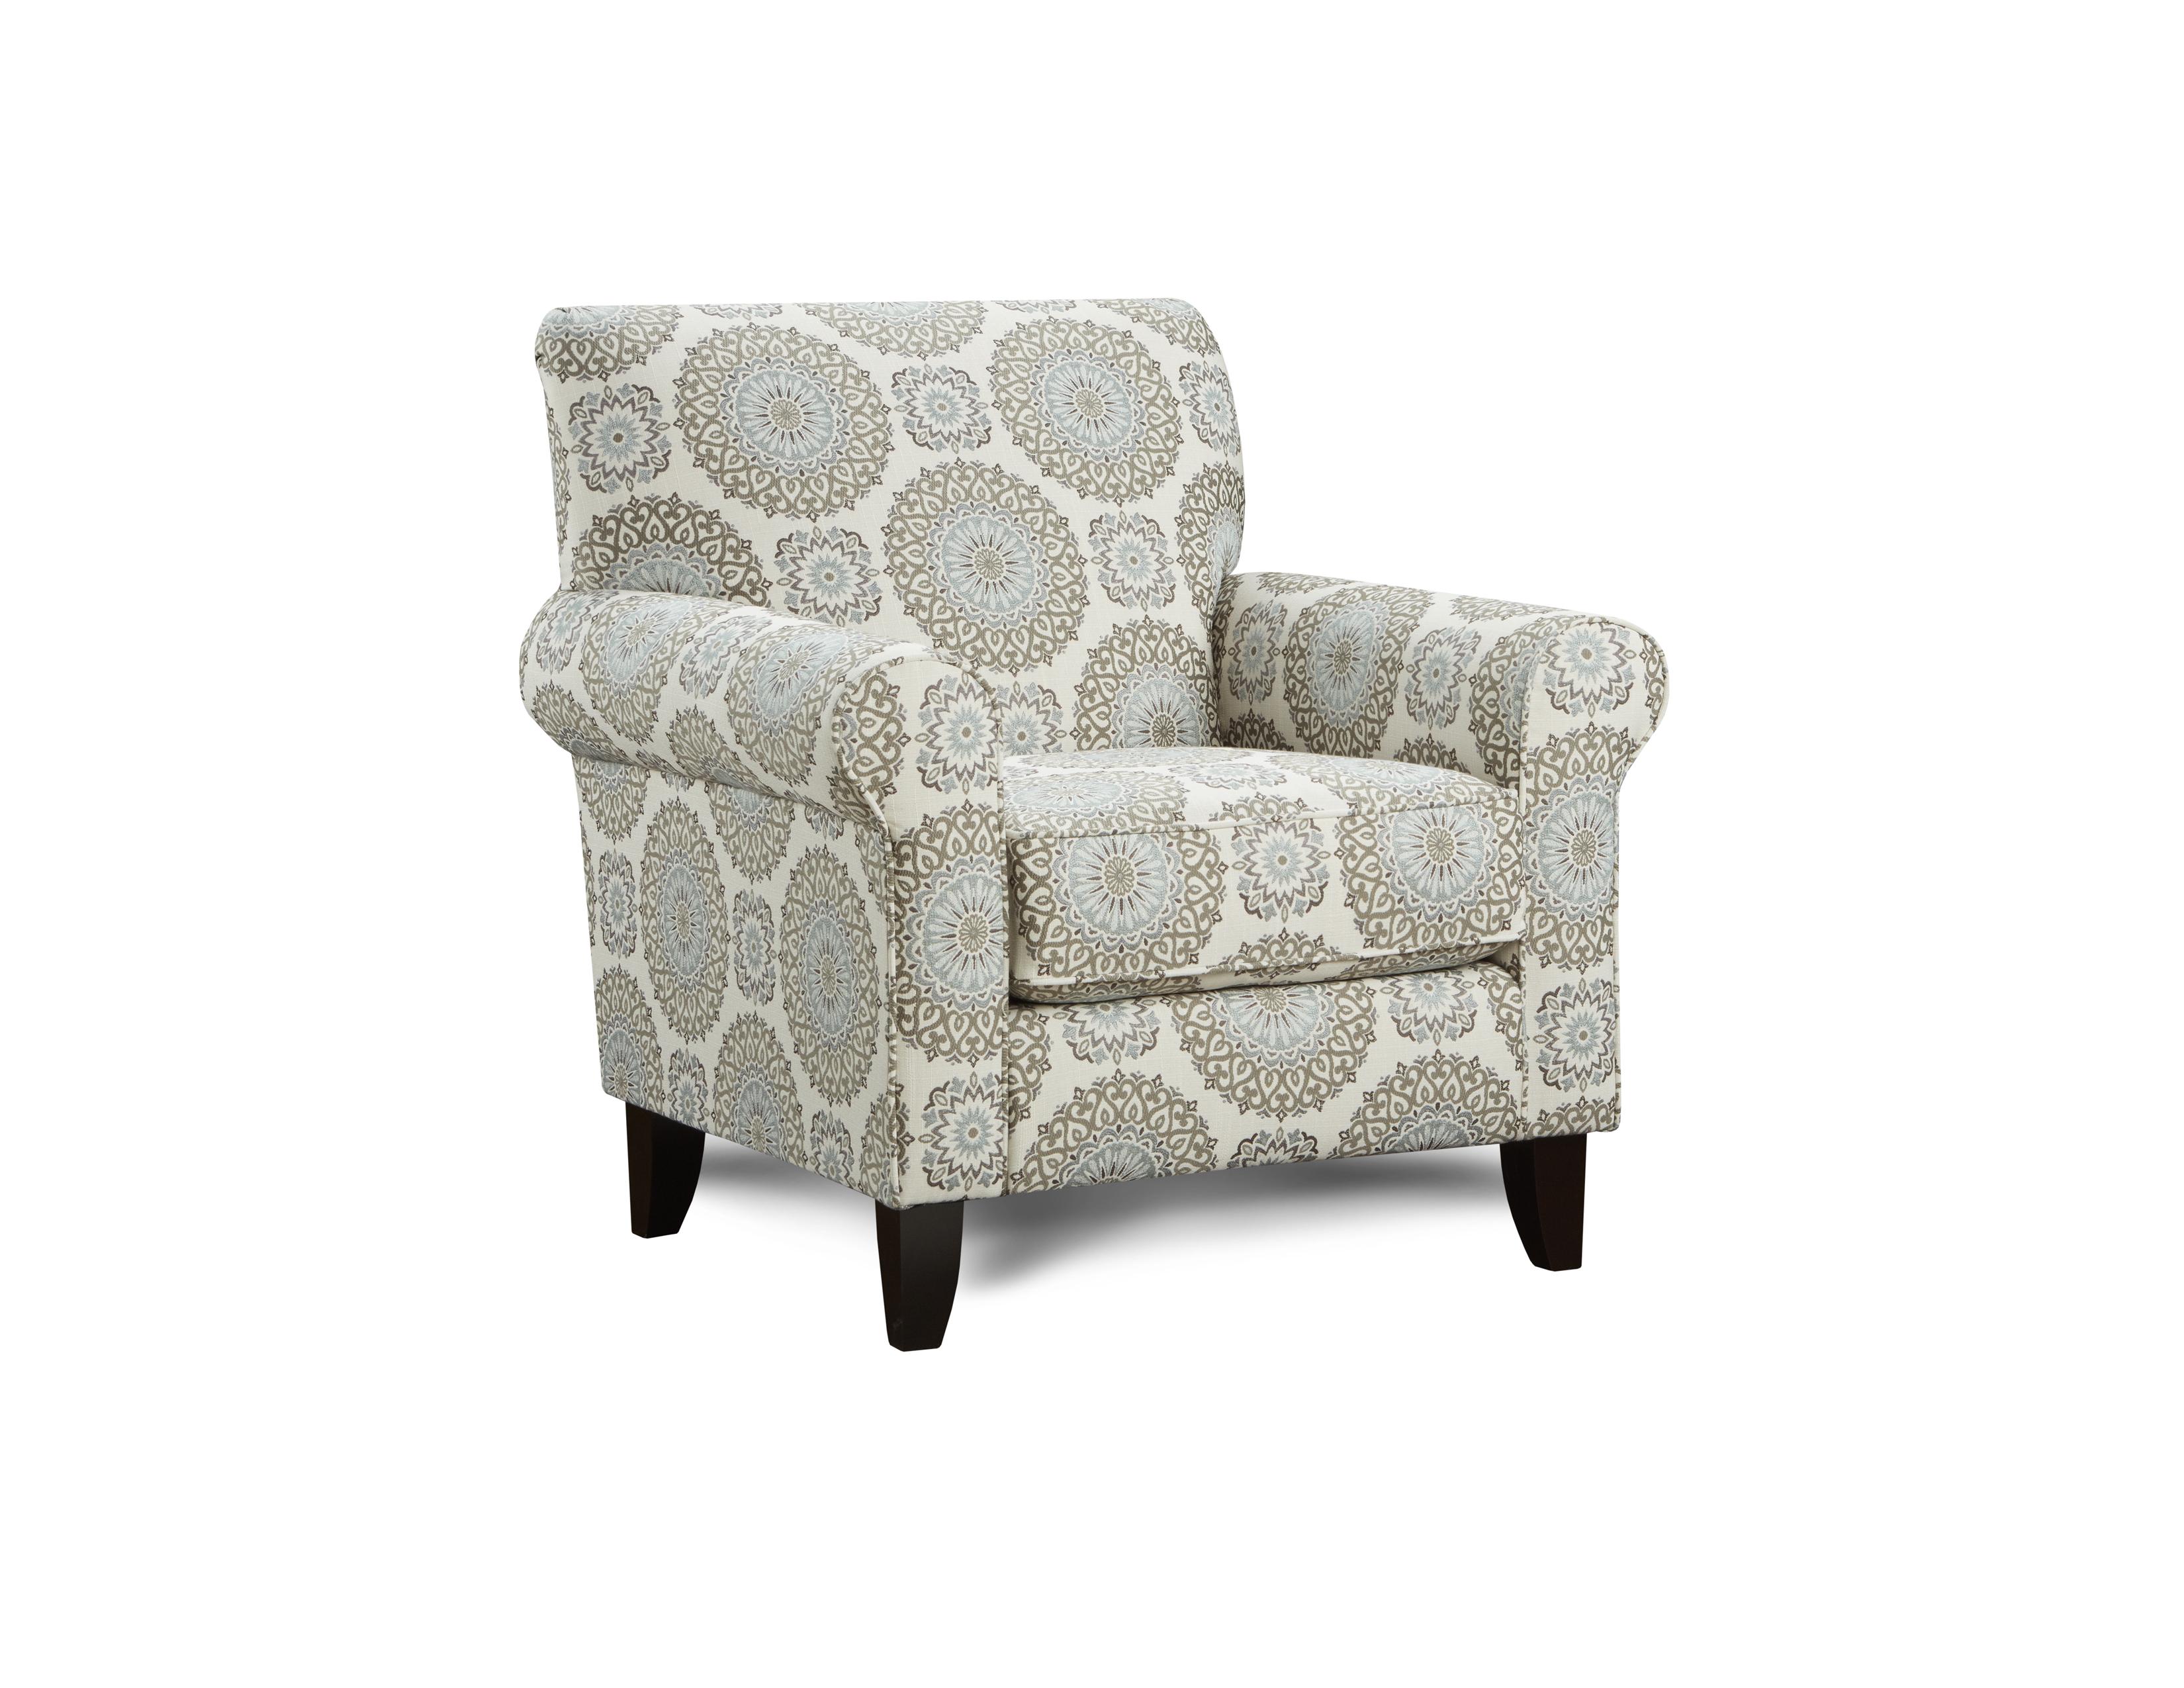 Grande Mist Fusion Furniture chair